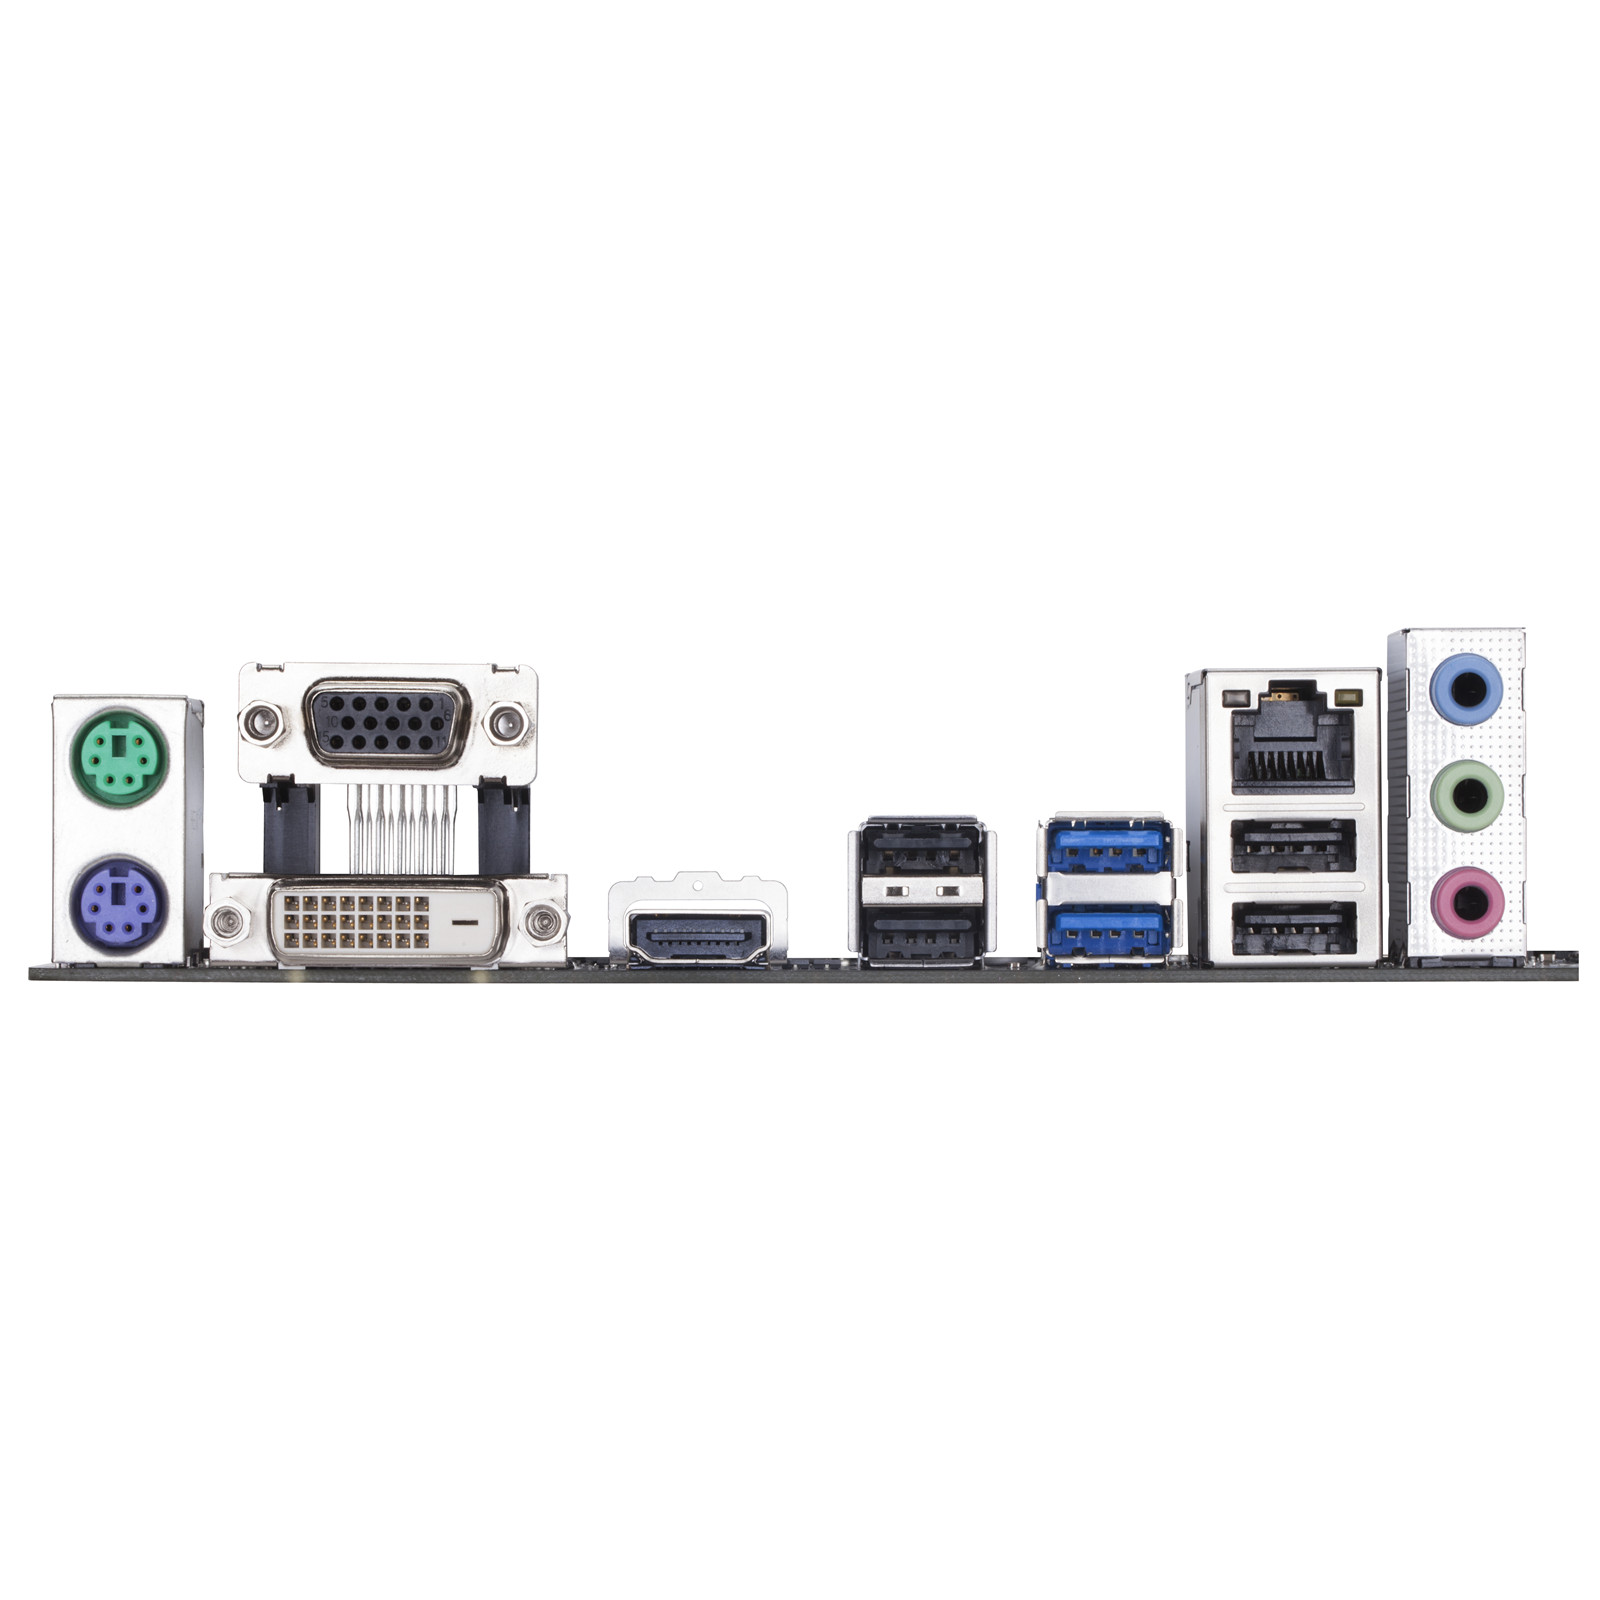 Buy the Gigabyte H310M S2H mATX For Intel 8th Gen Coffee